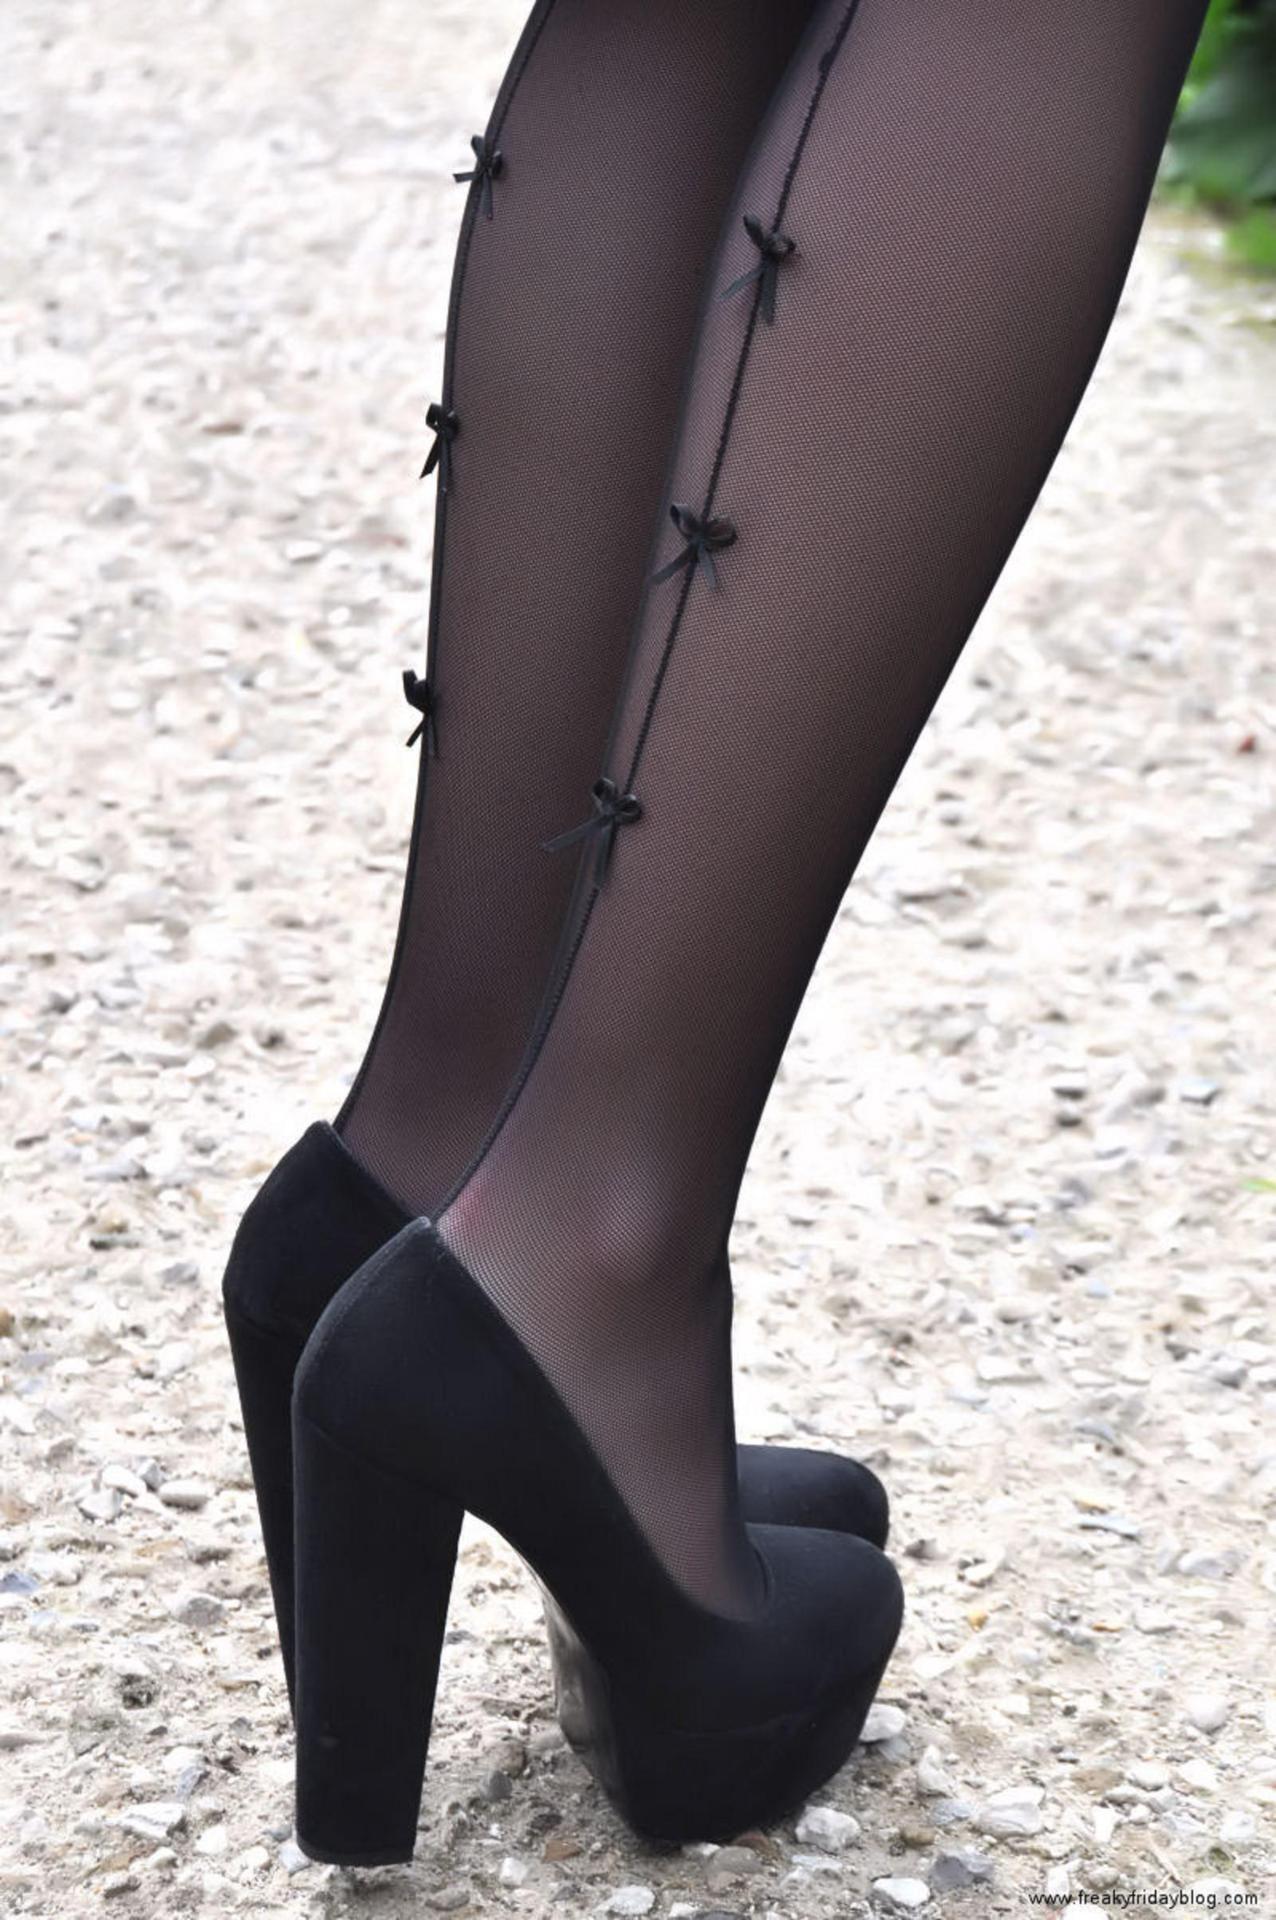 Pantyhose and platform shoes